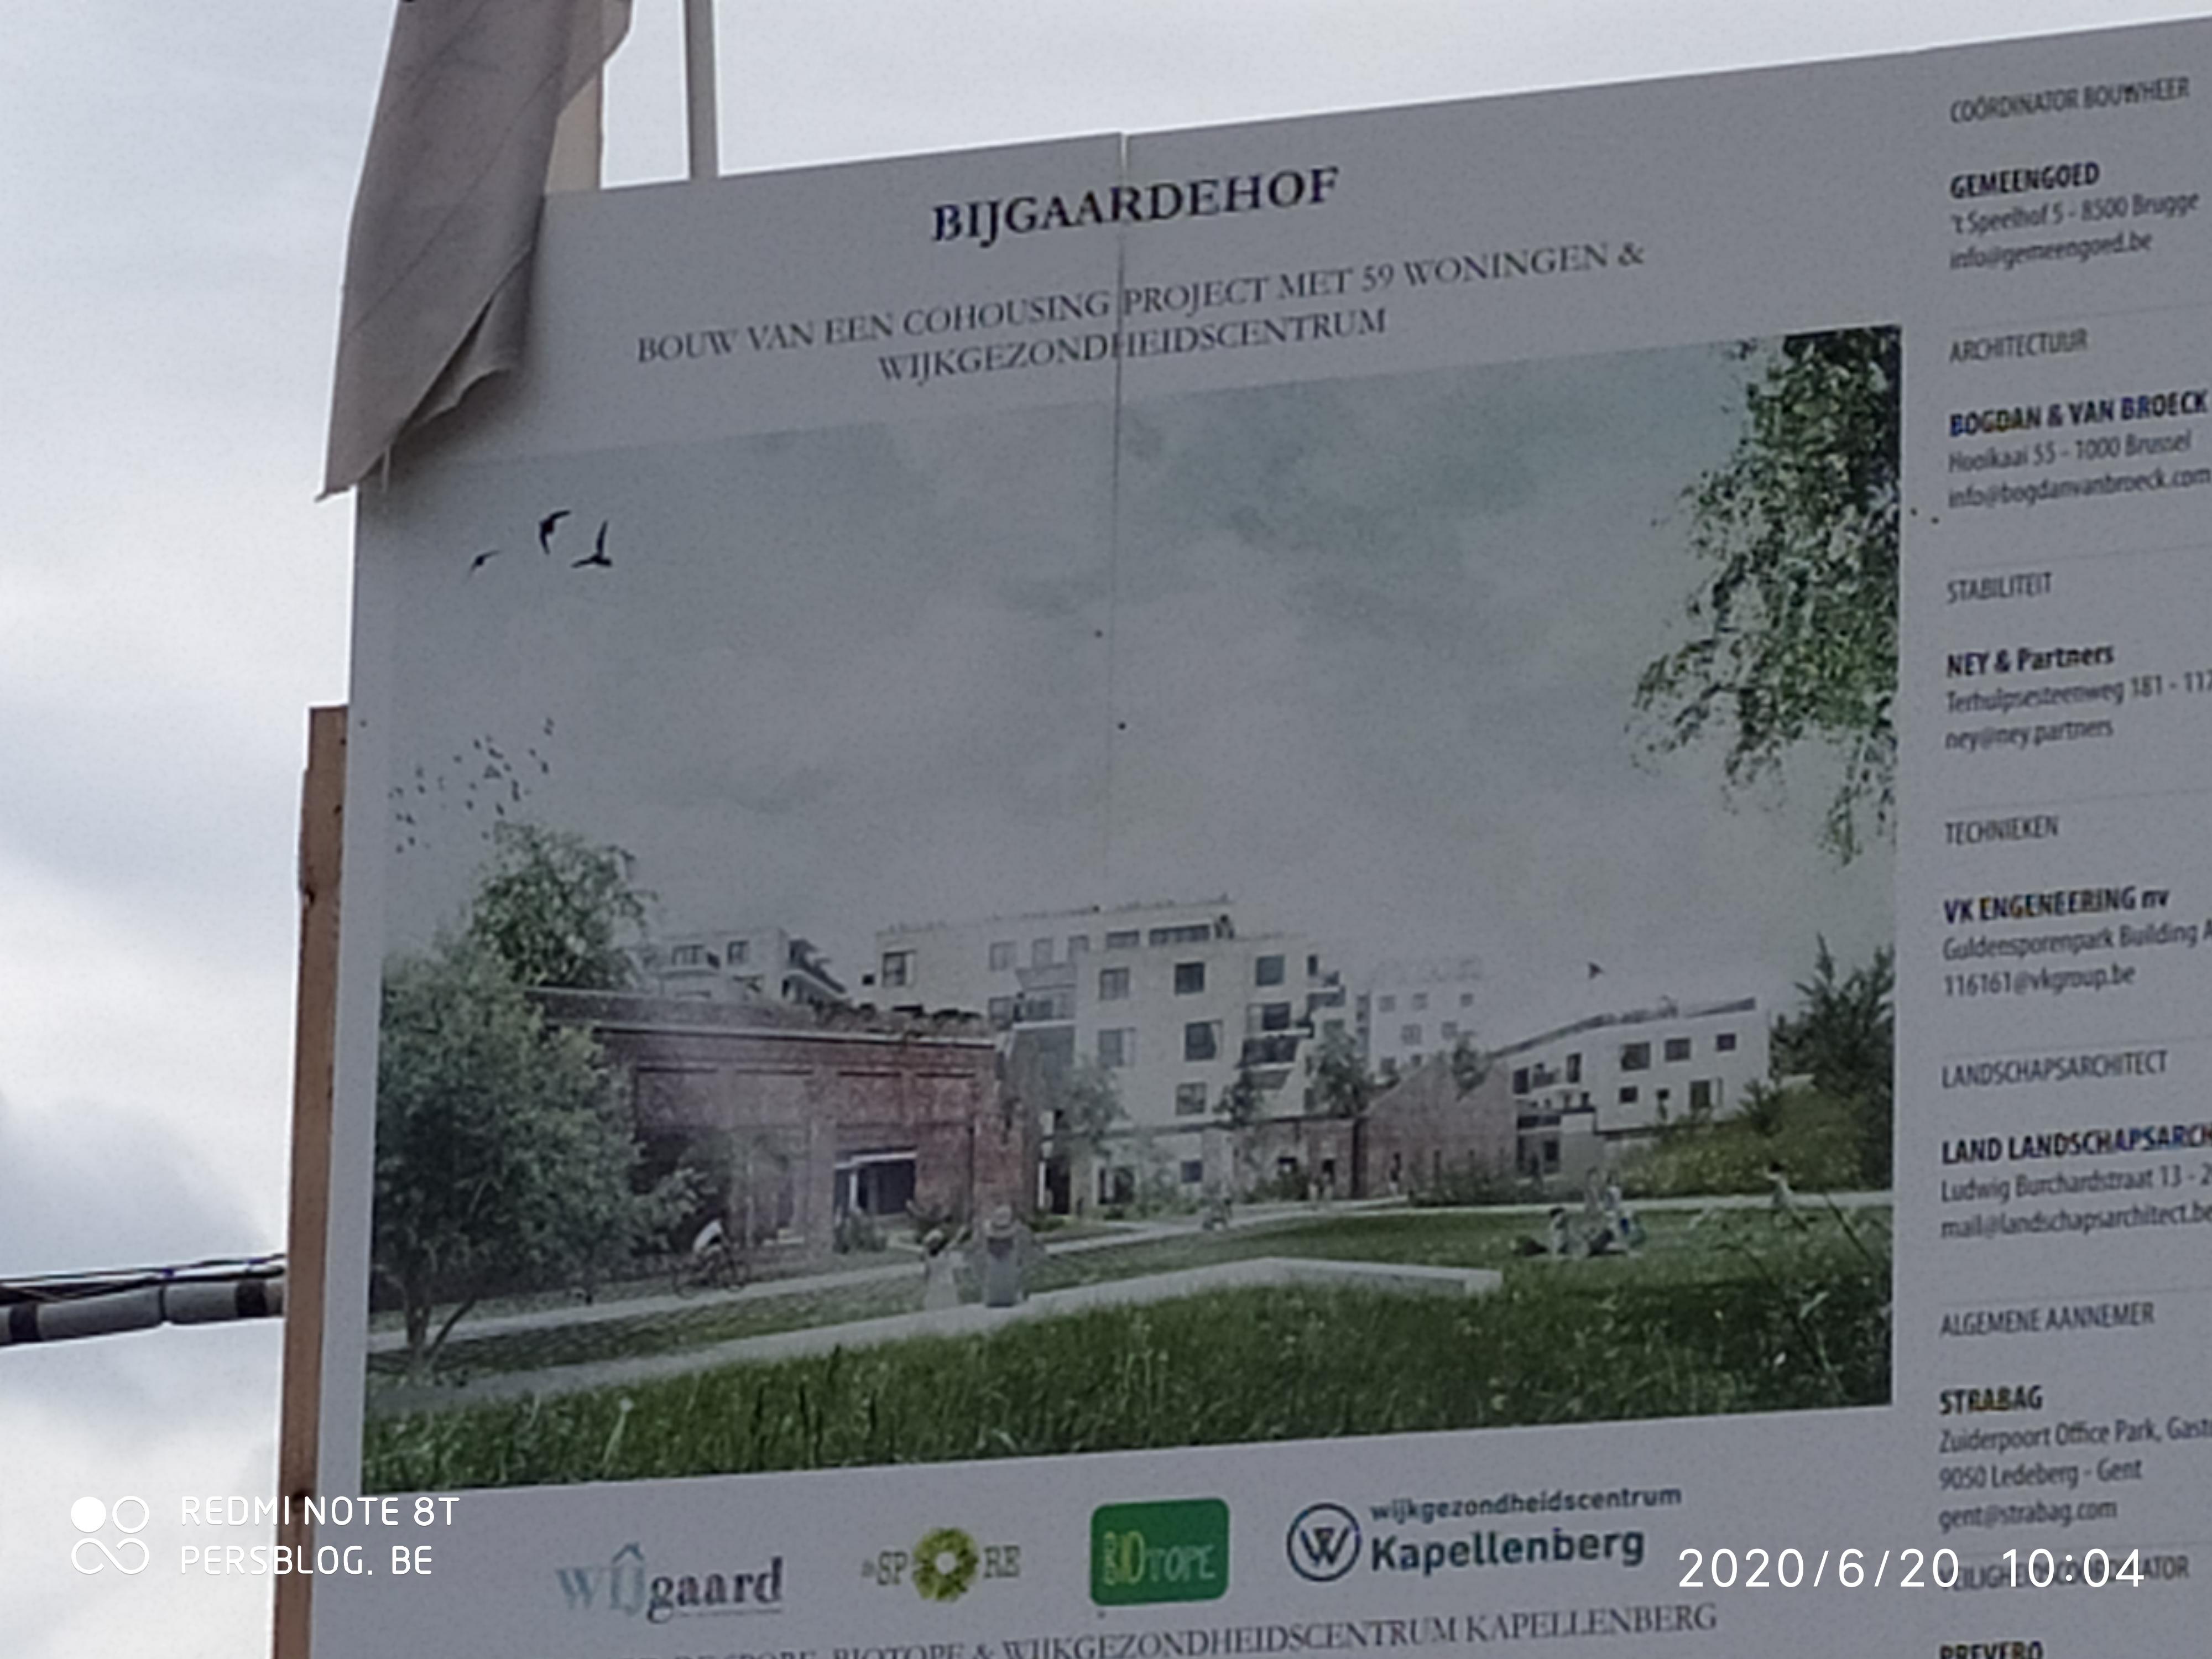 Nijverheidstraat -Dendermondsesteenweg - Bijgaardepark - Sint-Amandsberg IMG_20200620_100410 (1)